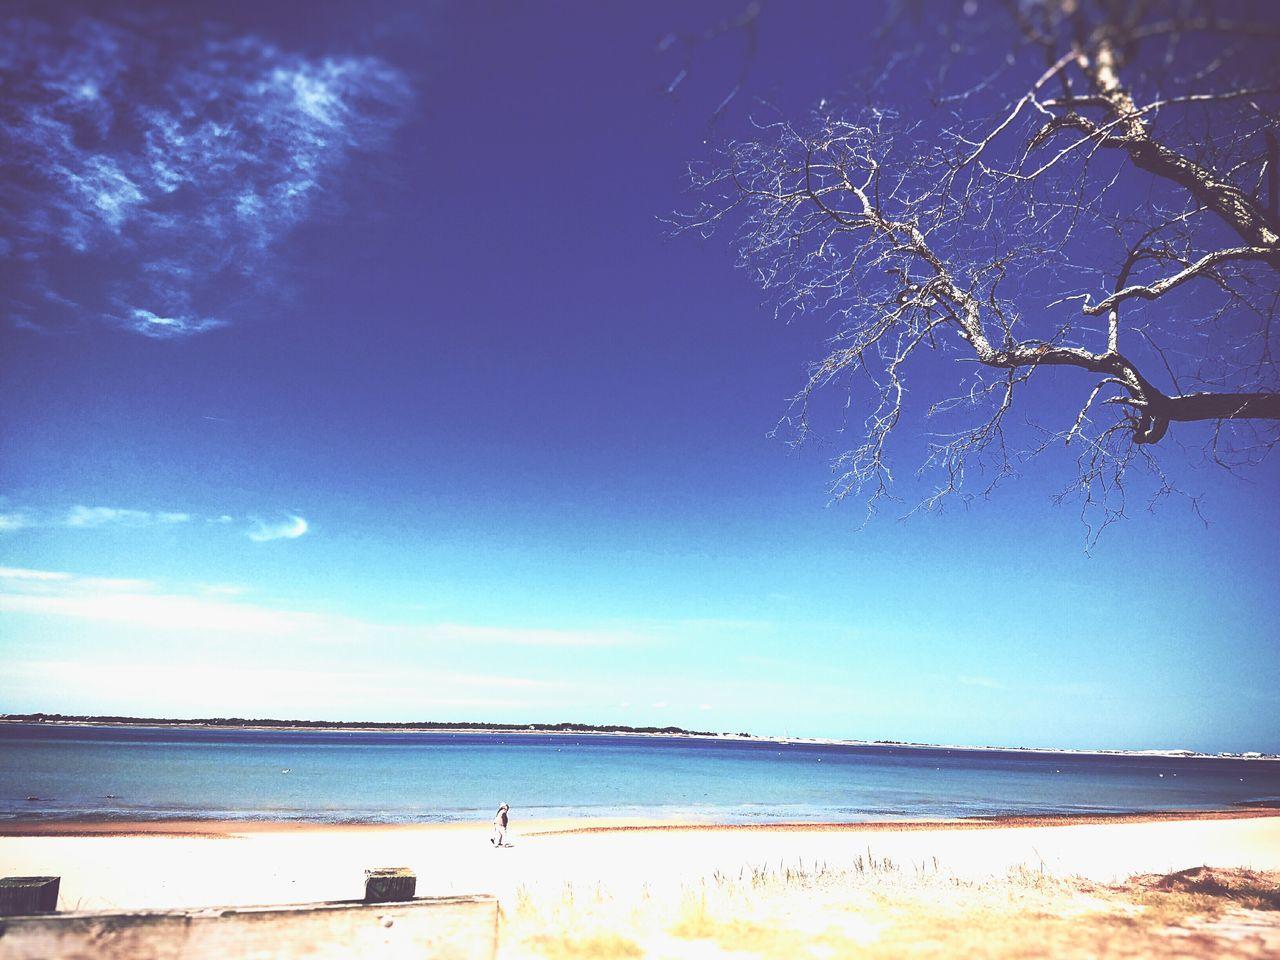 Beach Capecod Capecodlife Newengland Travel Explore